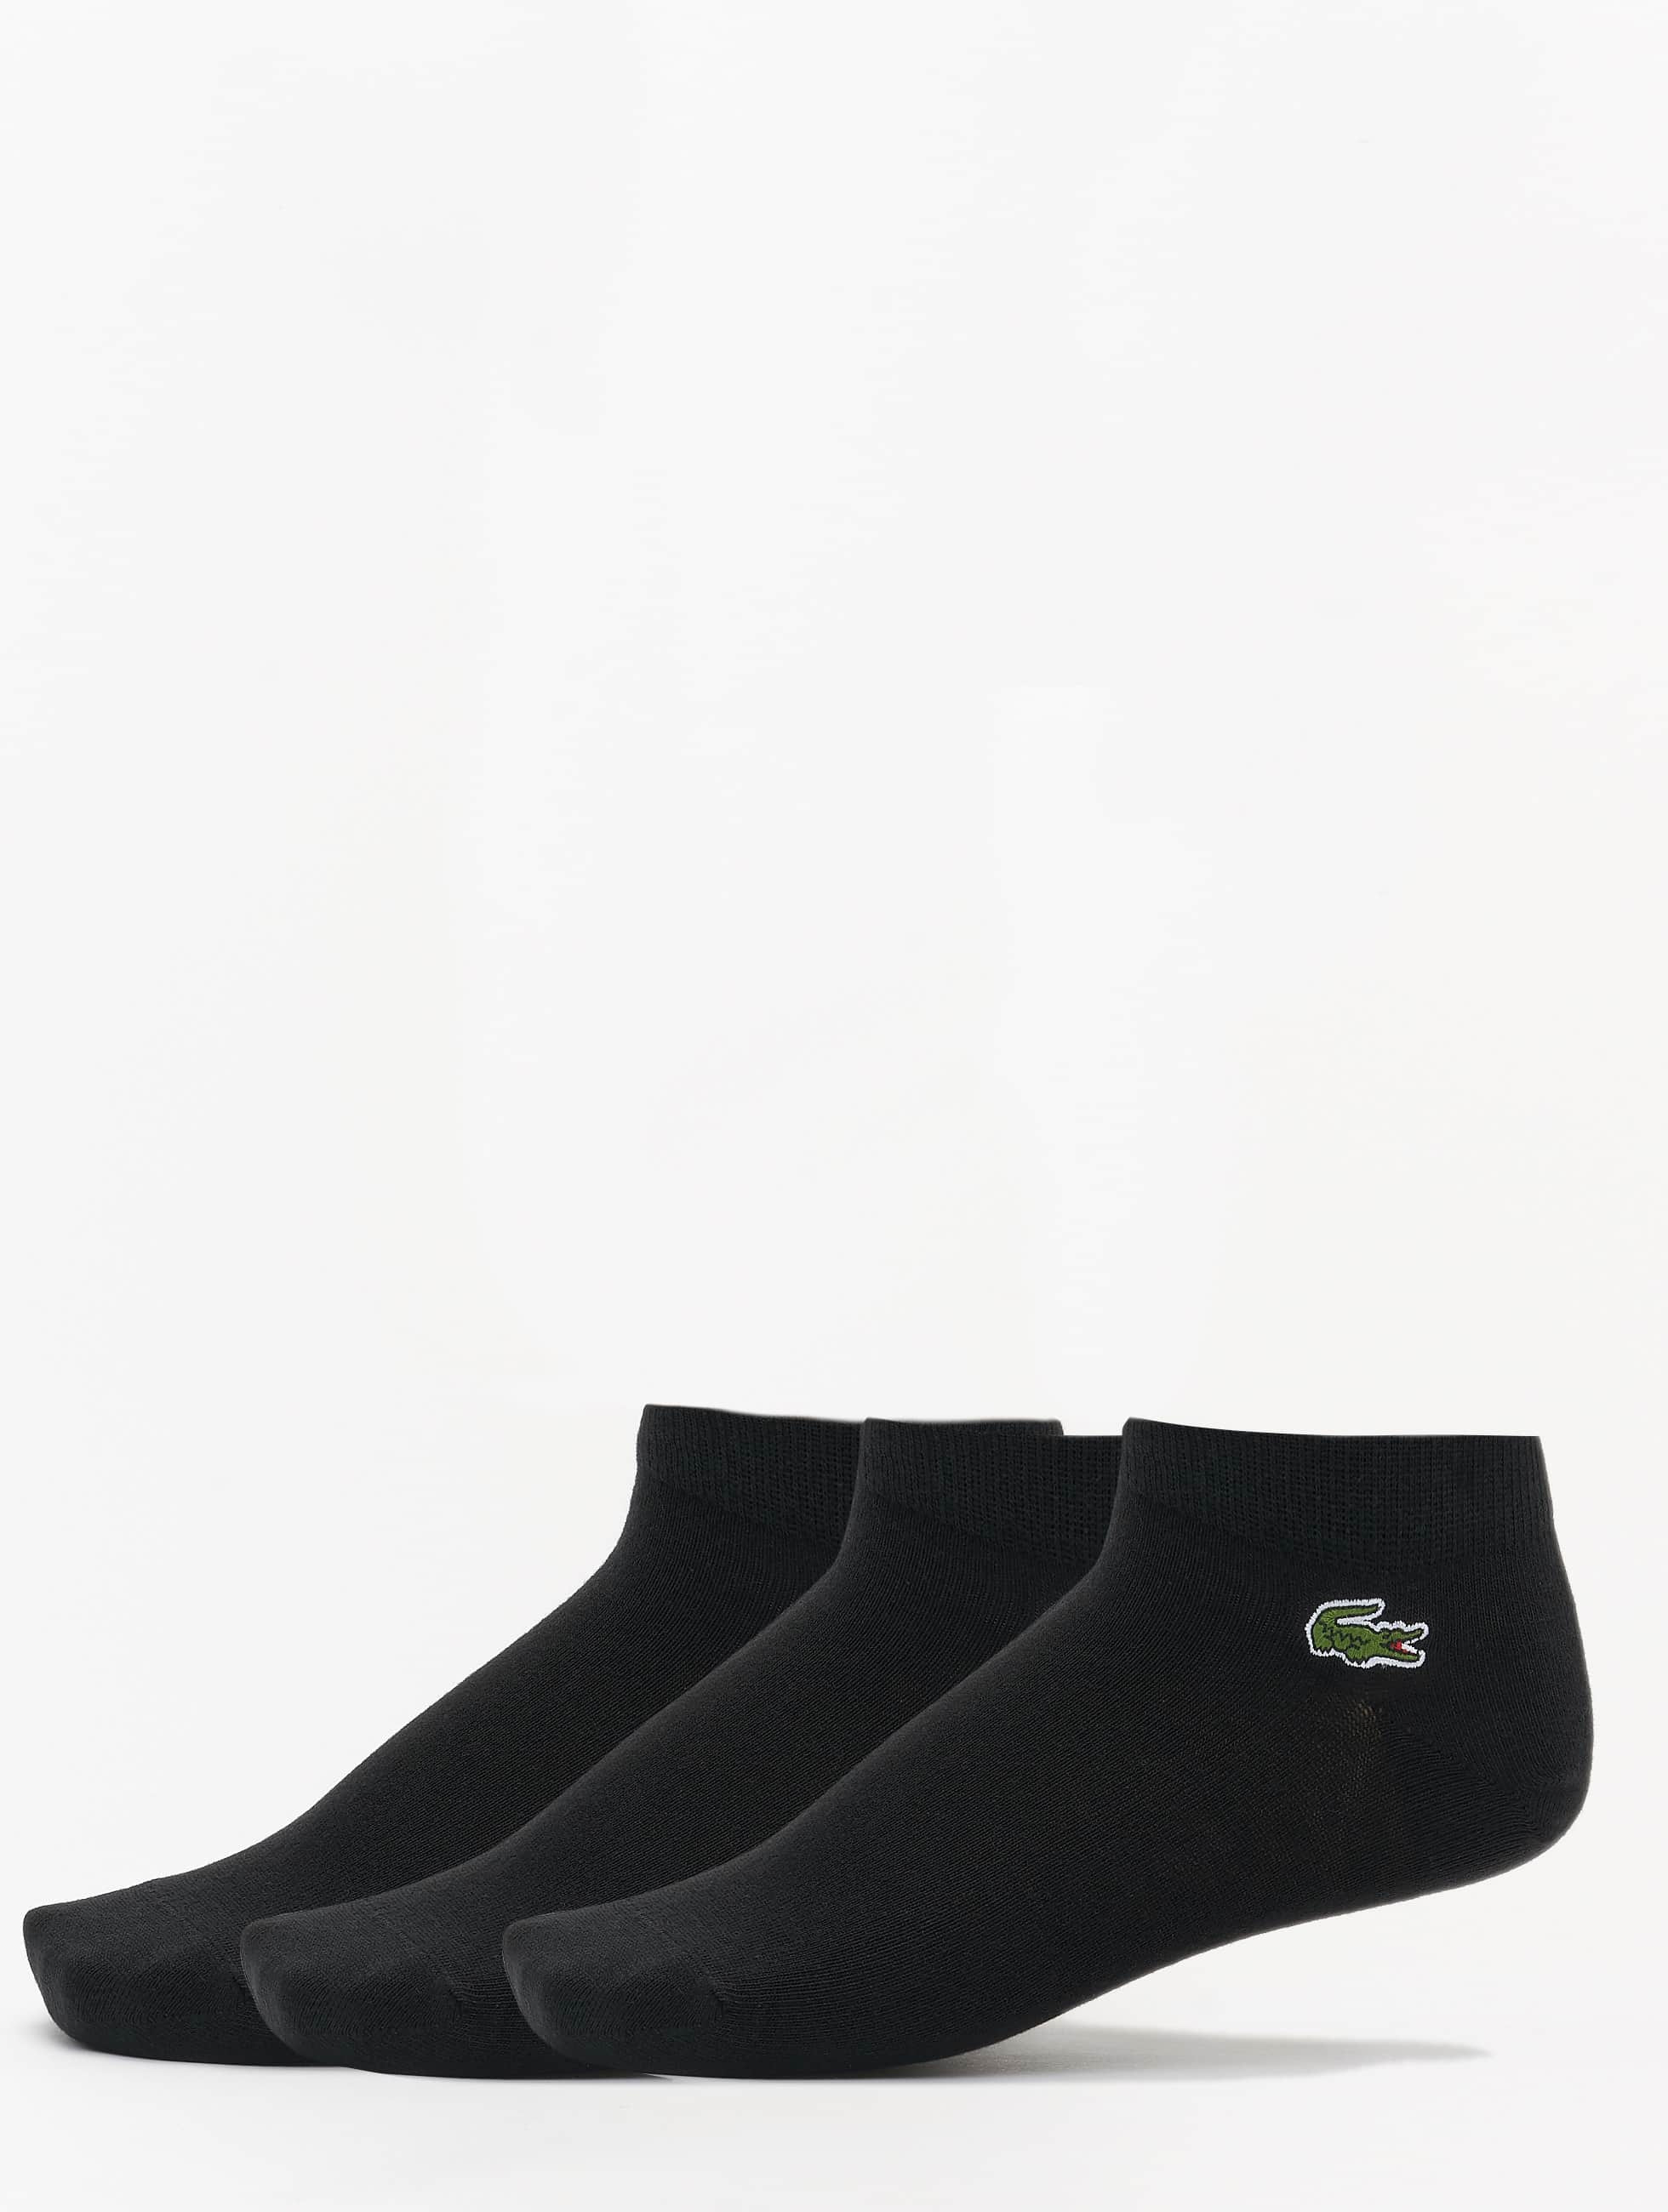 Lacoste Classic Chaussettes 3er-Pack Socks noir